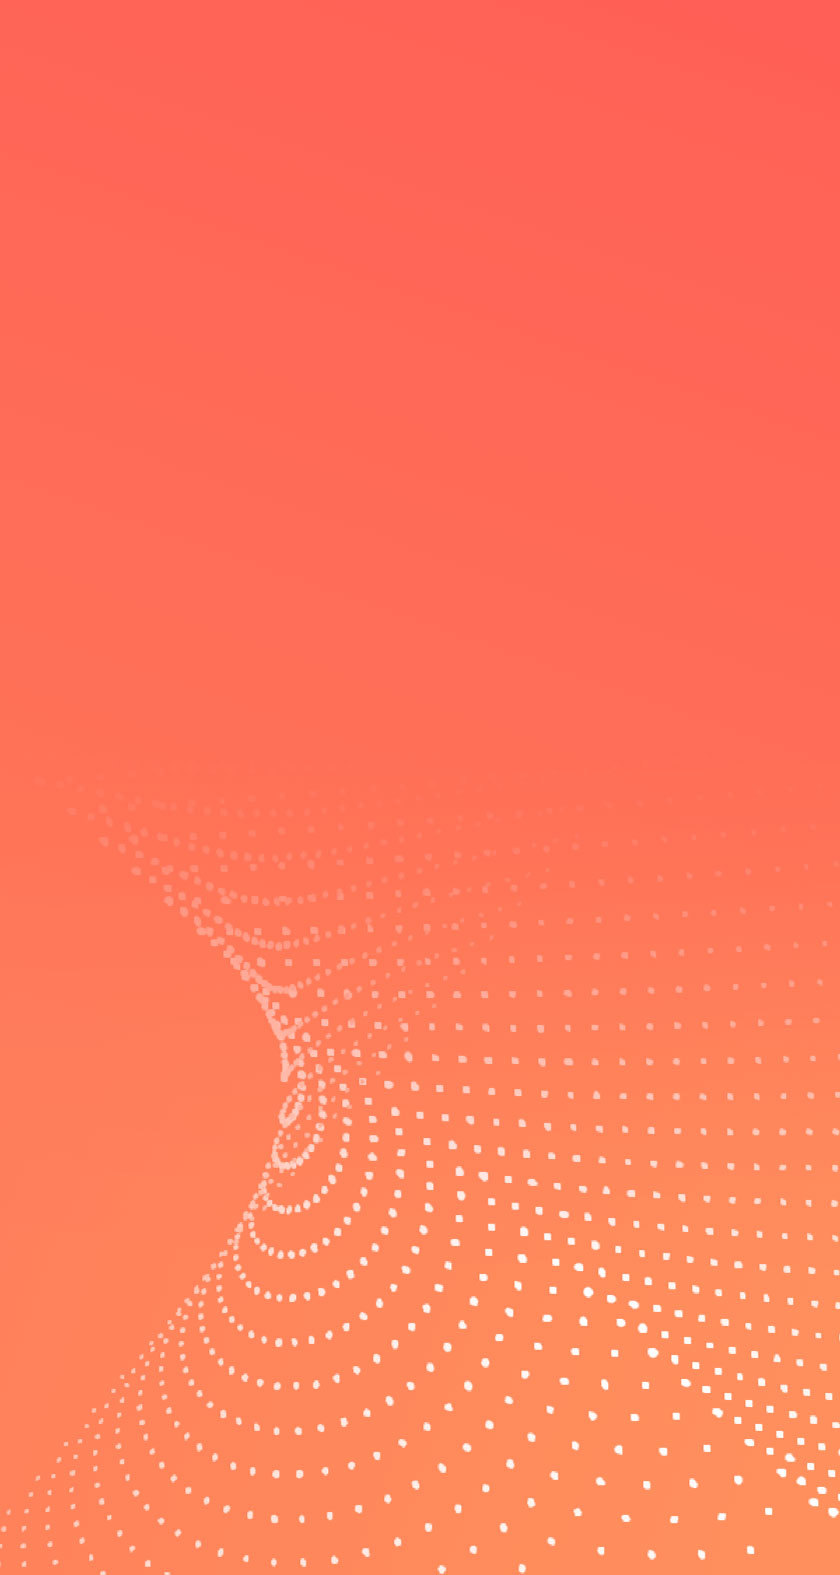 Image of Exchange bg mobile